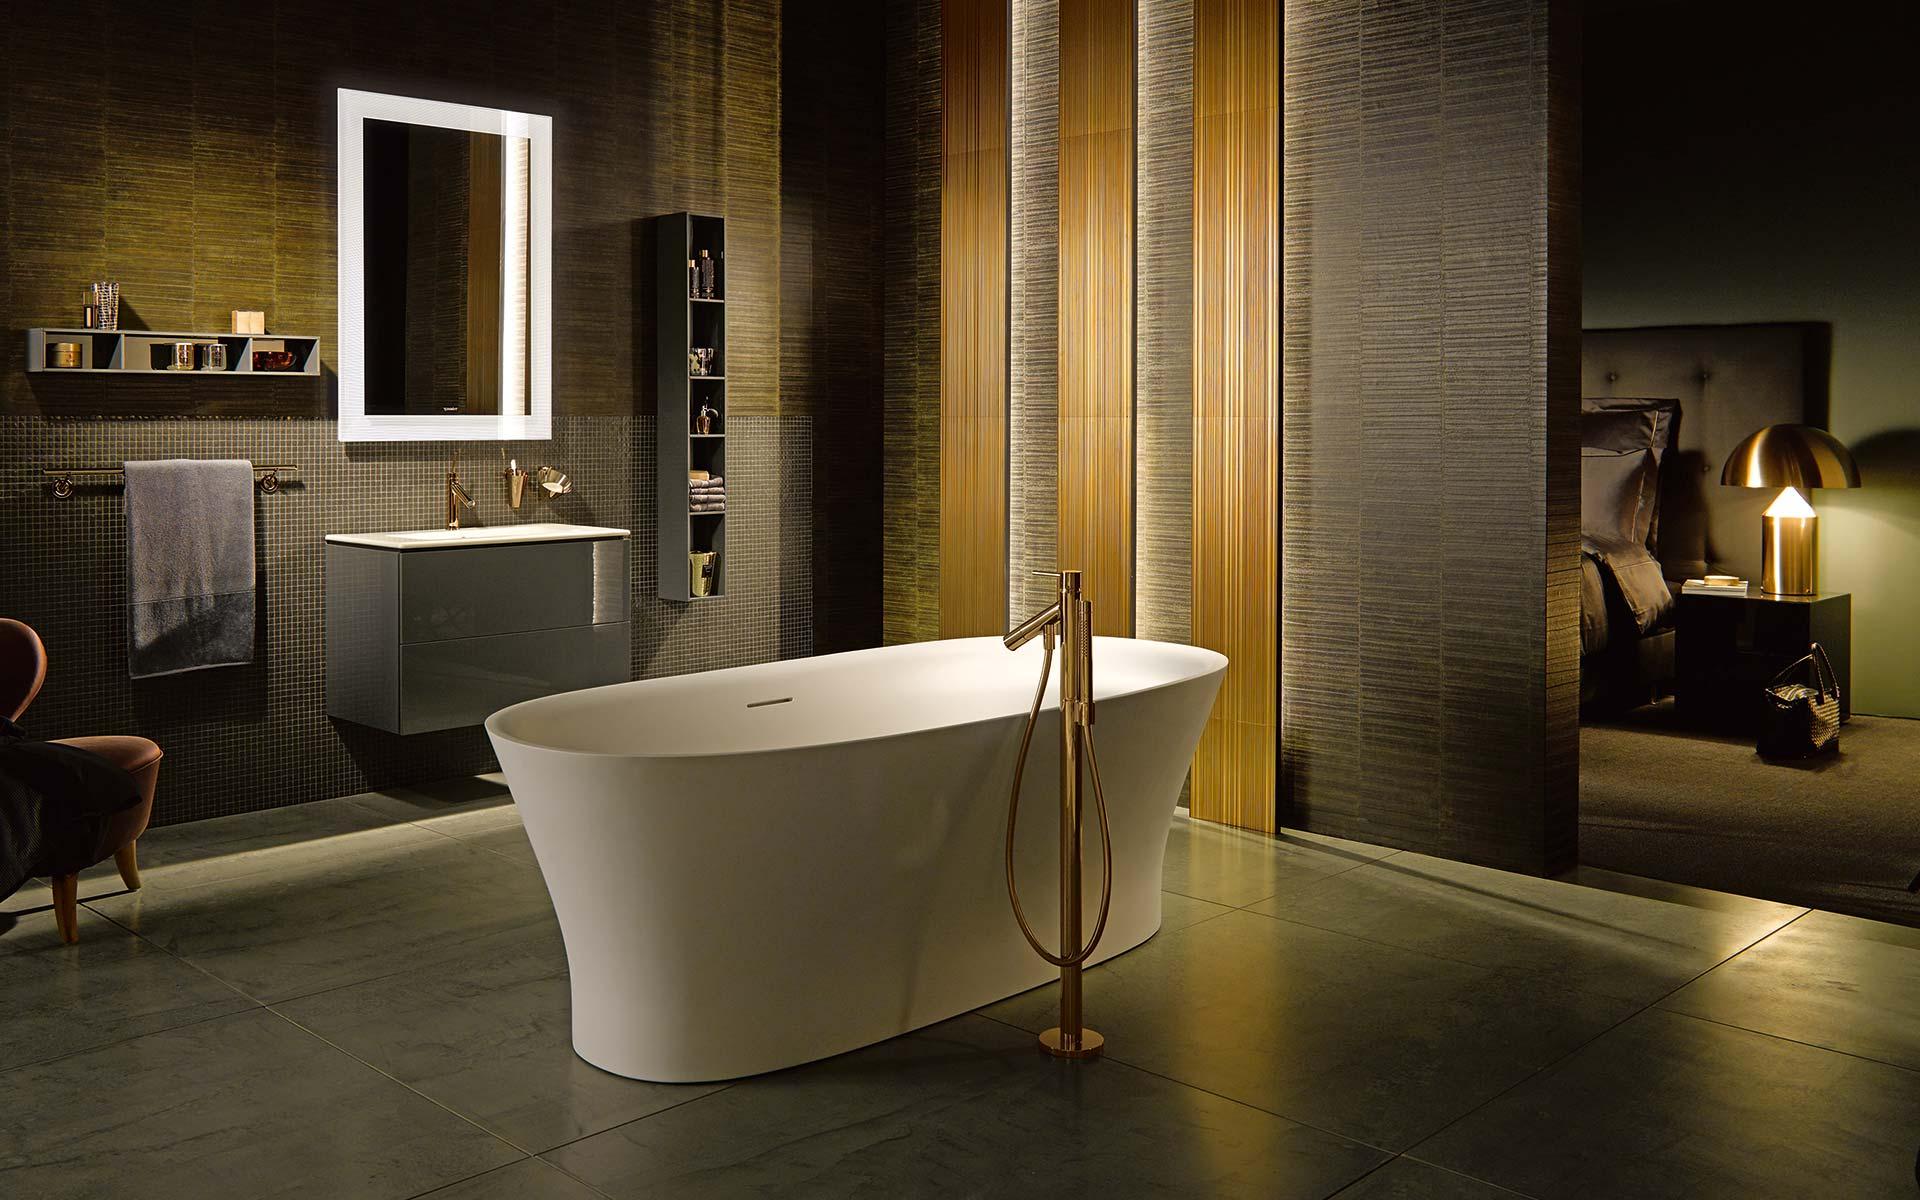 Badezimmer Gestaltung - Hans G. Bock